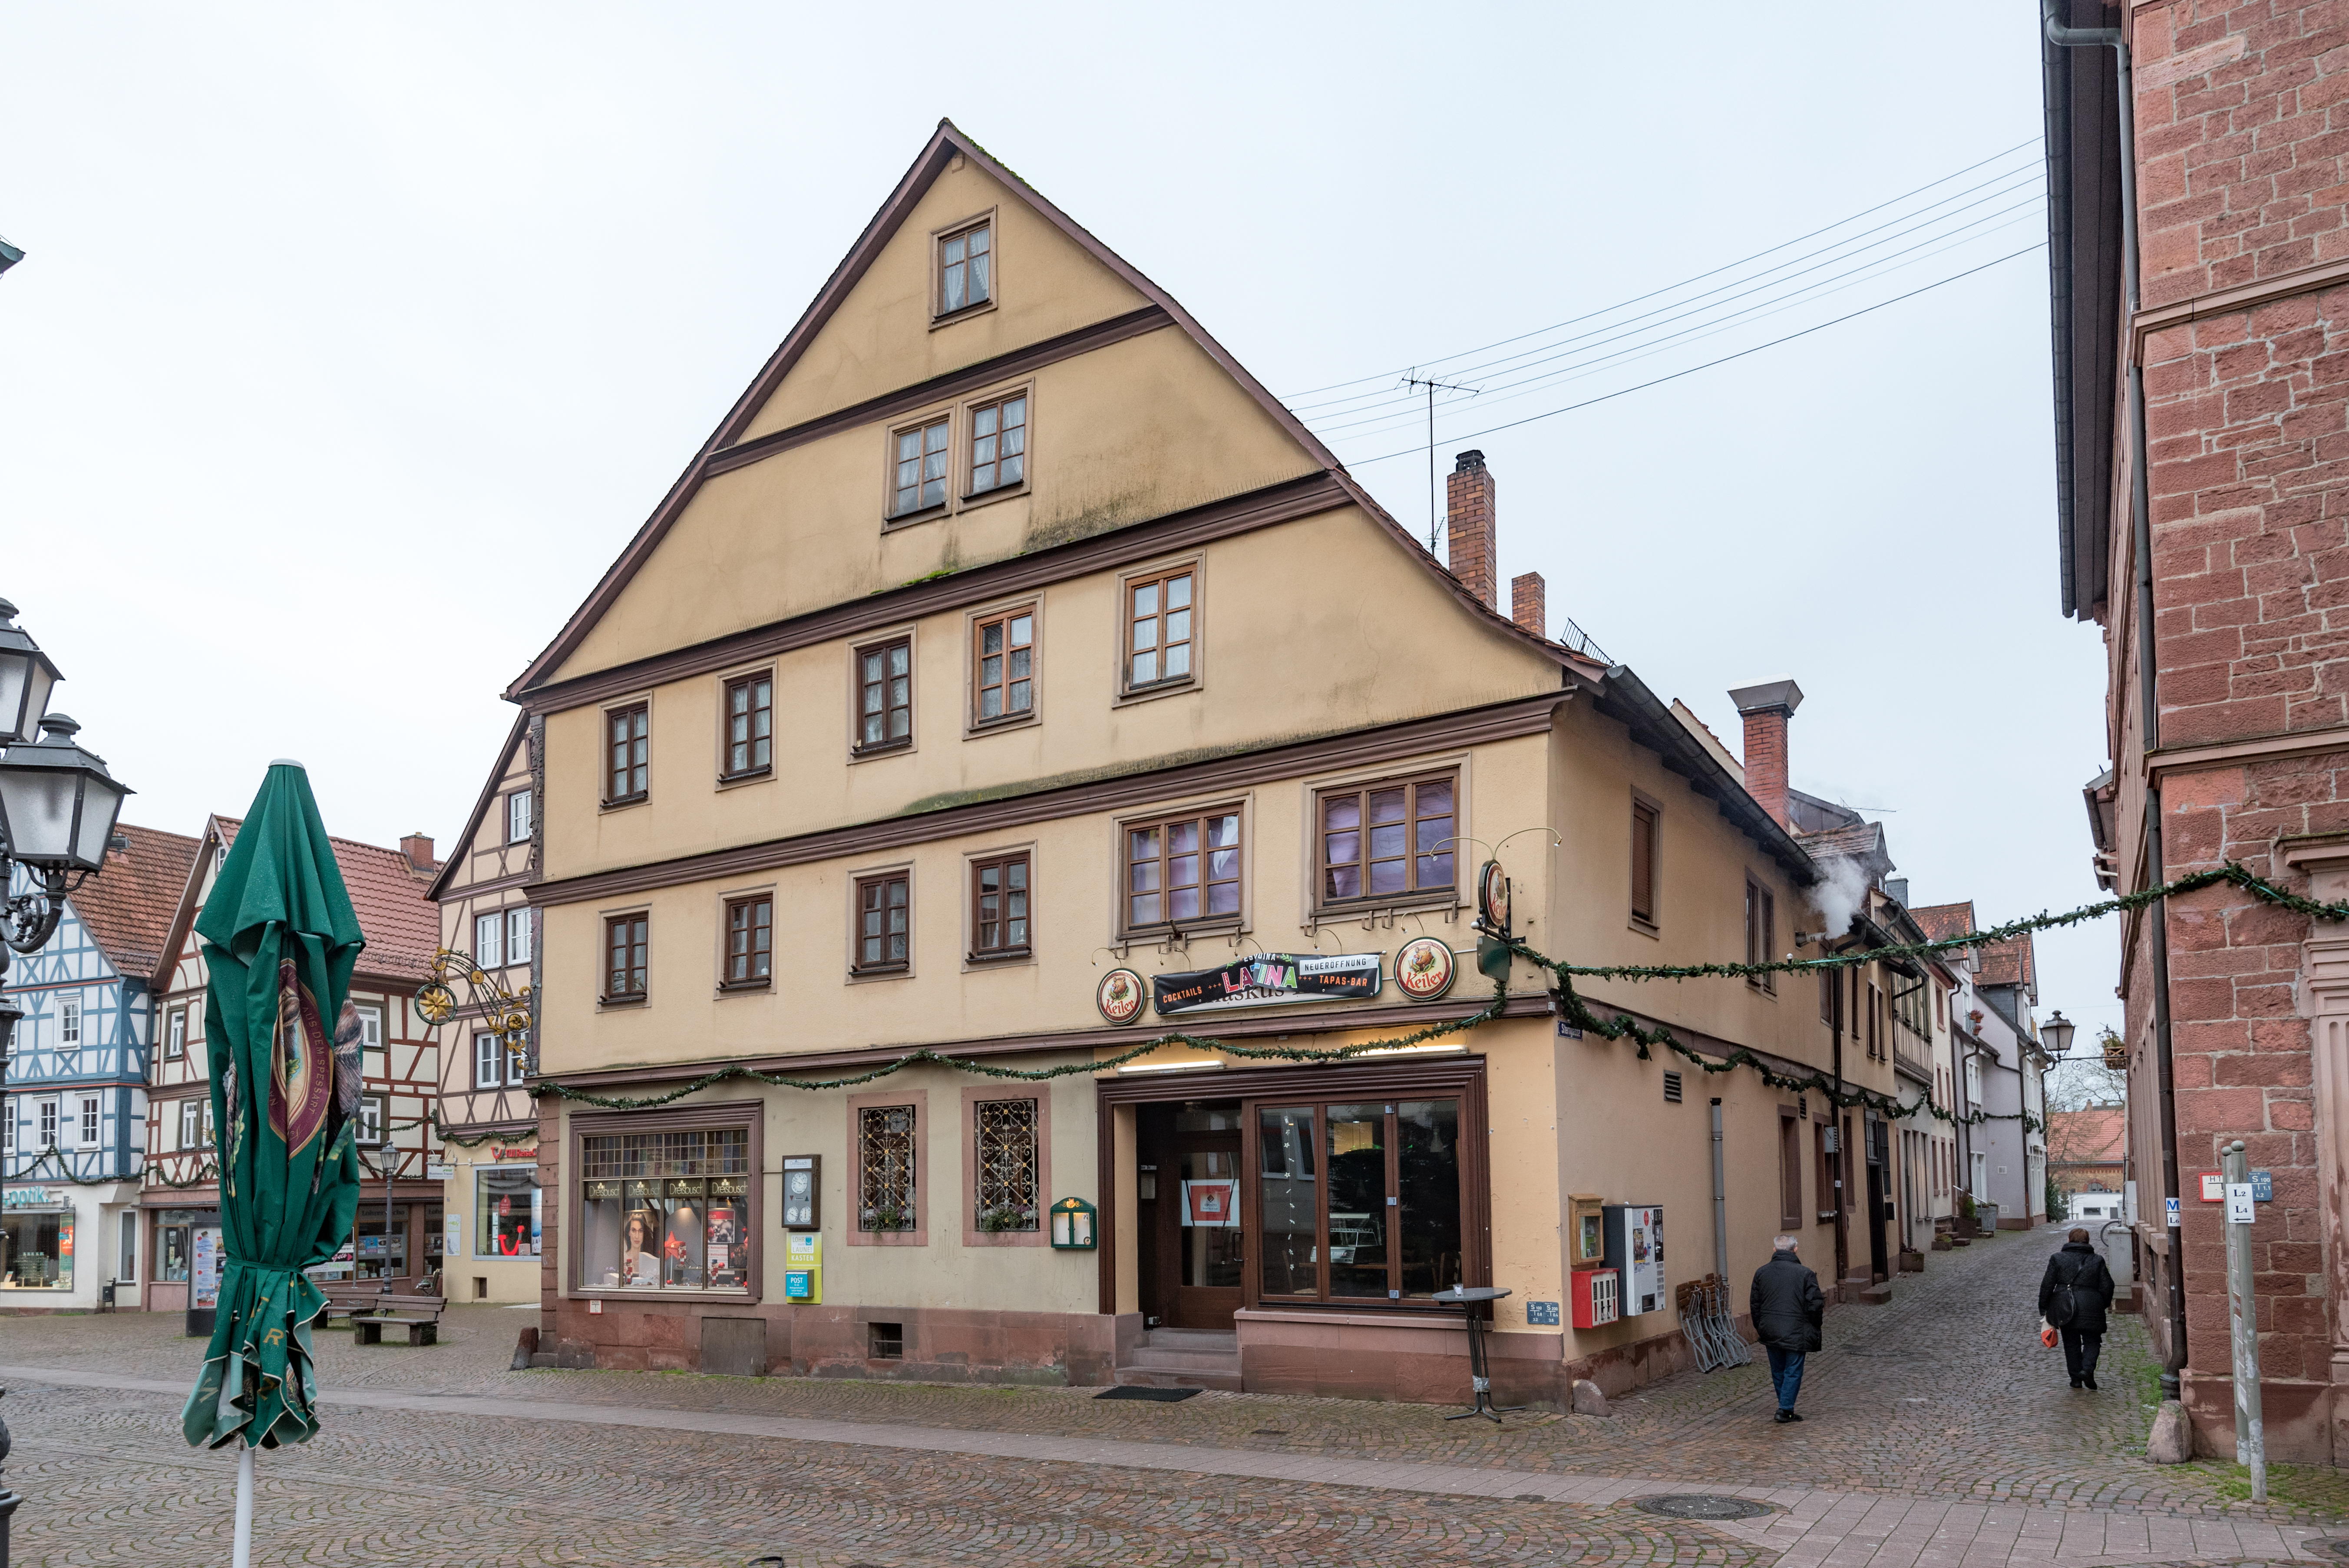 File:Hauptstraße 27, 29 Lohr am Main 20191222 001.jpg